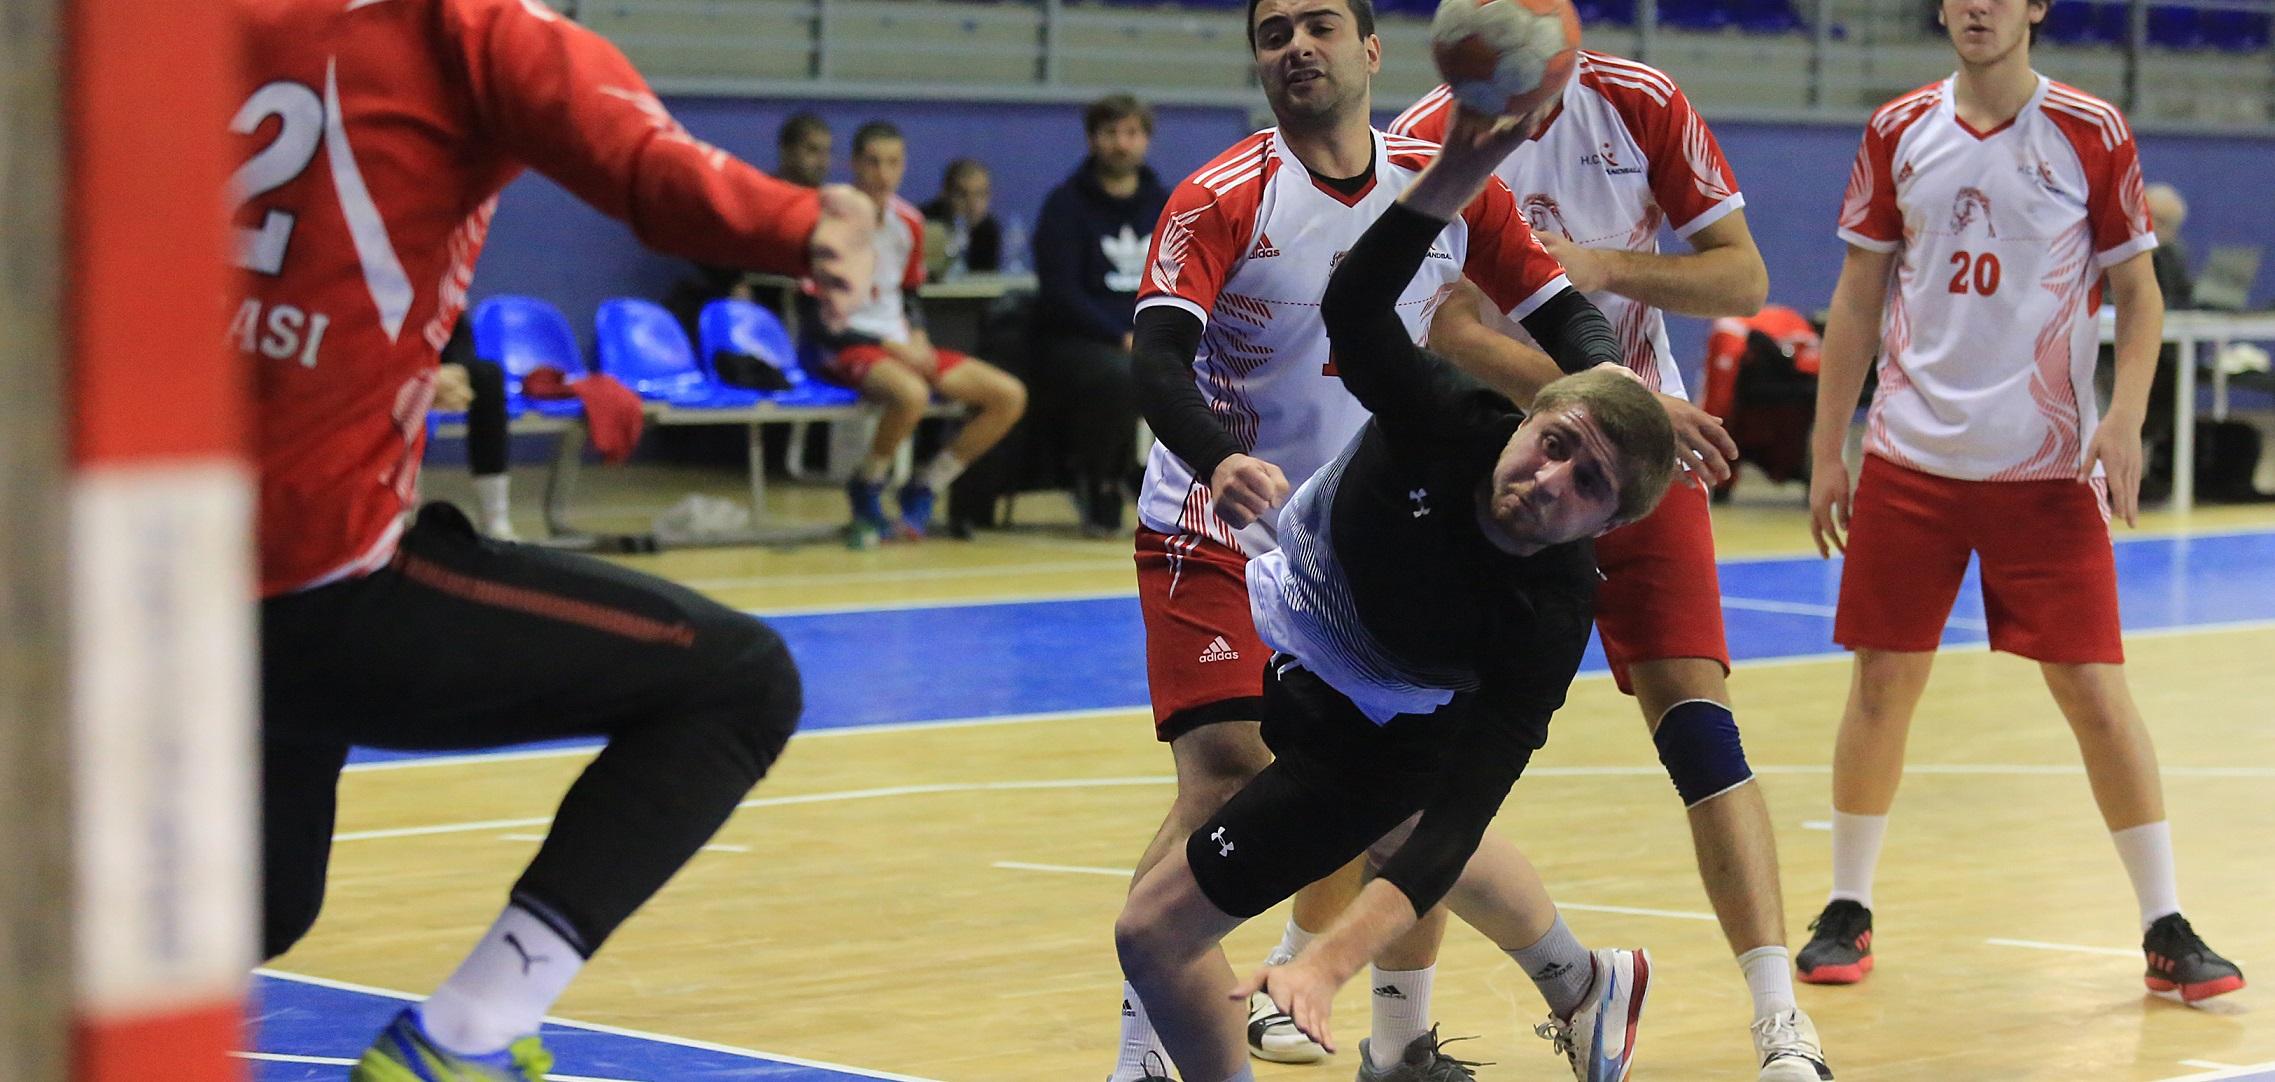 Handball Cham